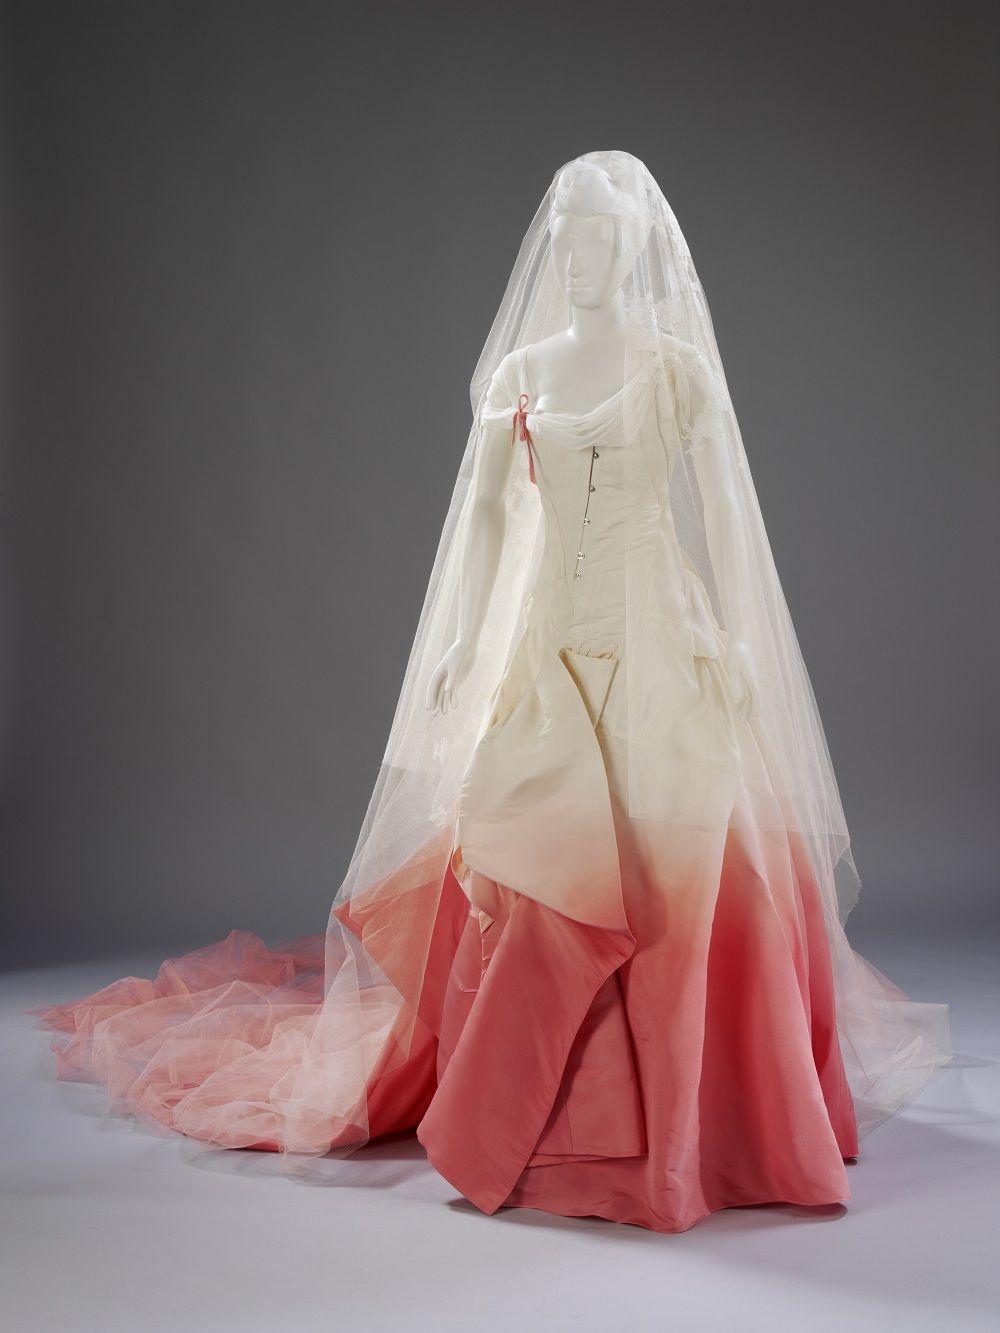 18th century wedding dress  gwennng      pixels  robes  Pinterest  Dress designs